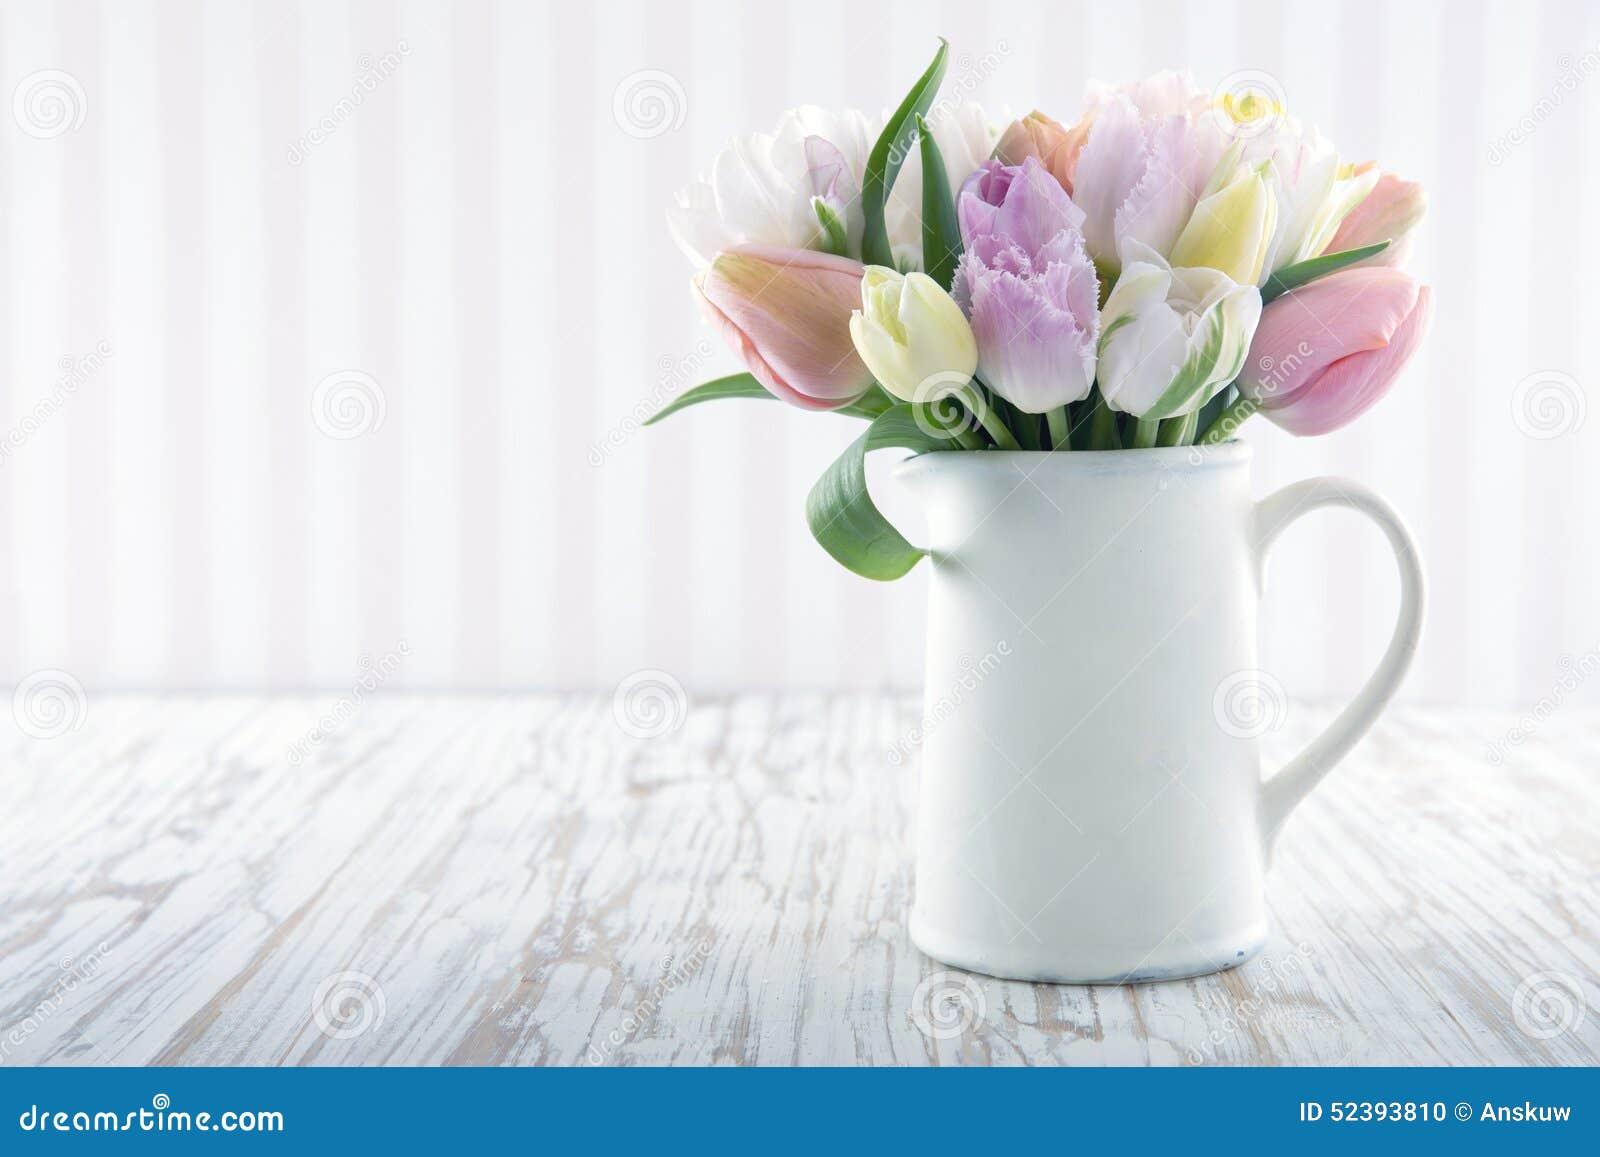 White Vase With Colorful Tulips Stock Photo Image 52393810